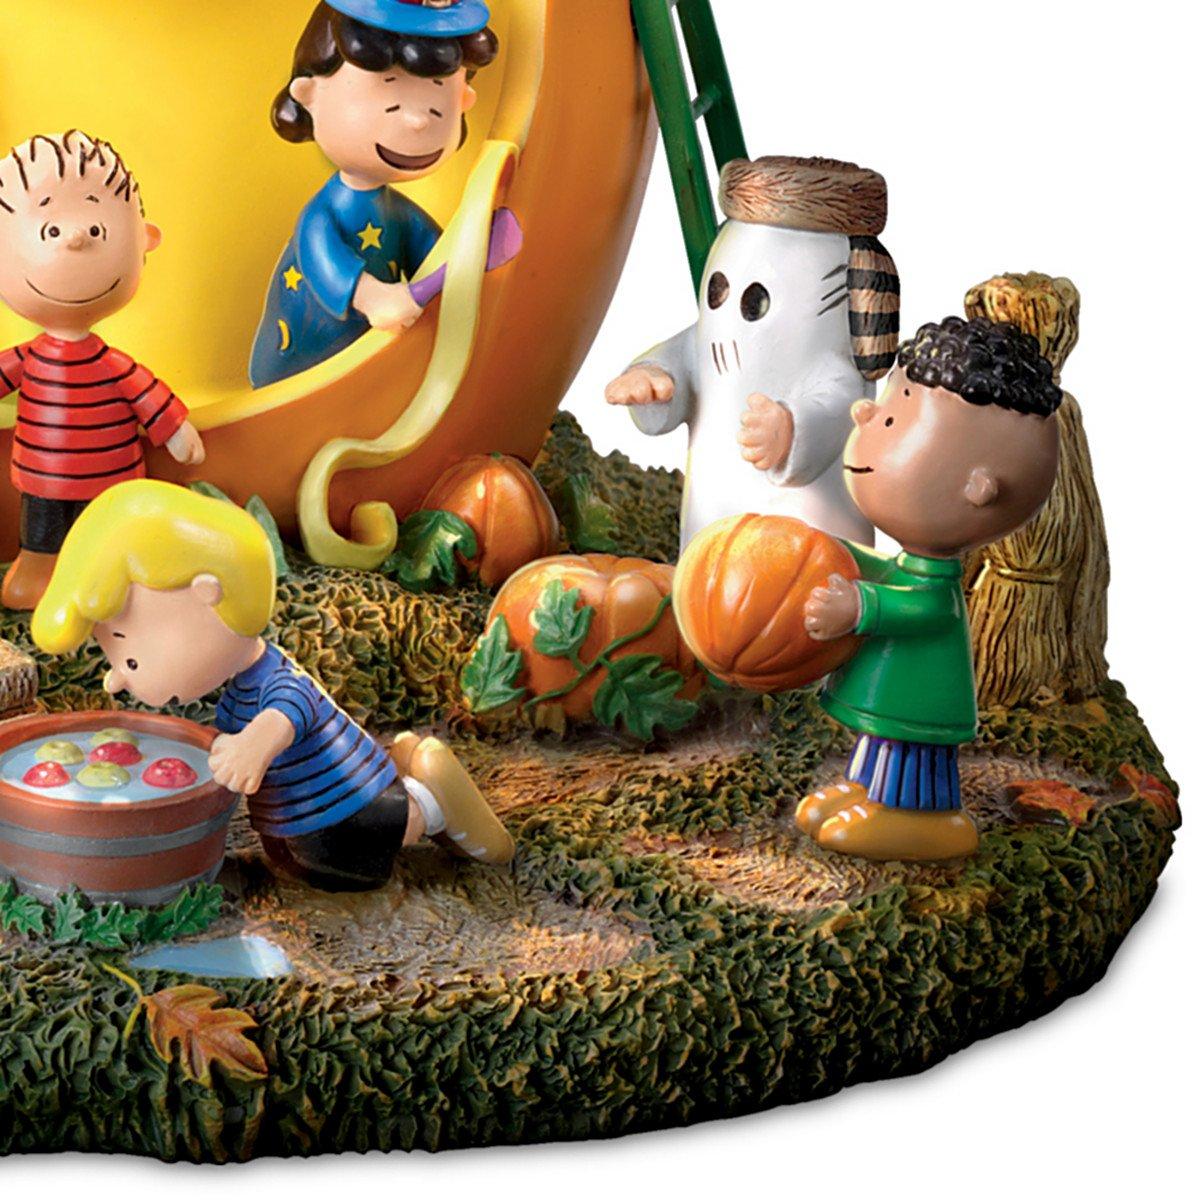 Amazon.com: Peanuts Great Pumpkin Carving Party Halloween ...